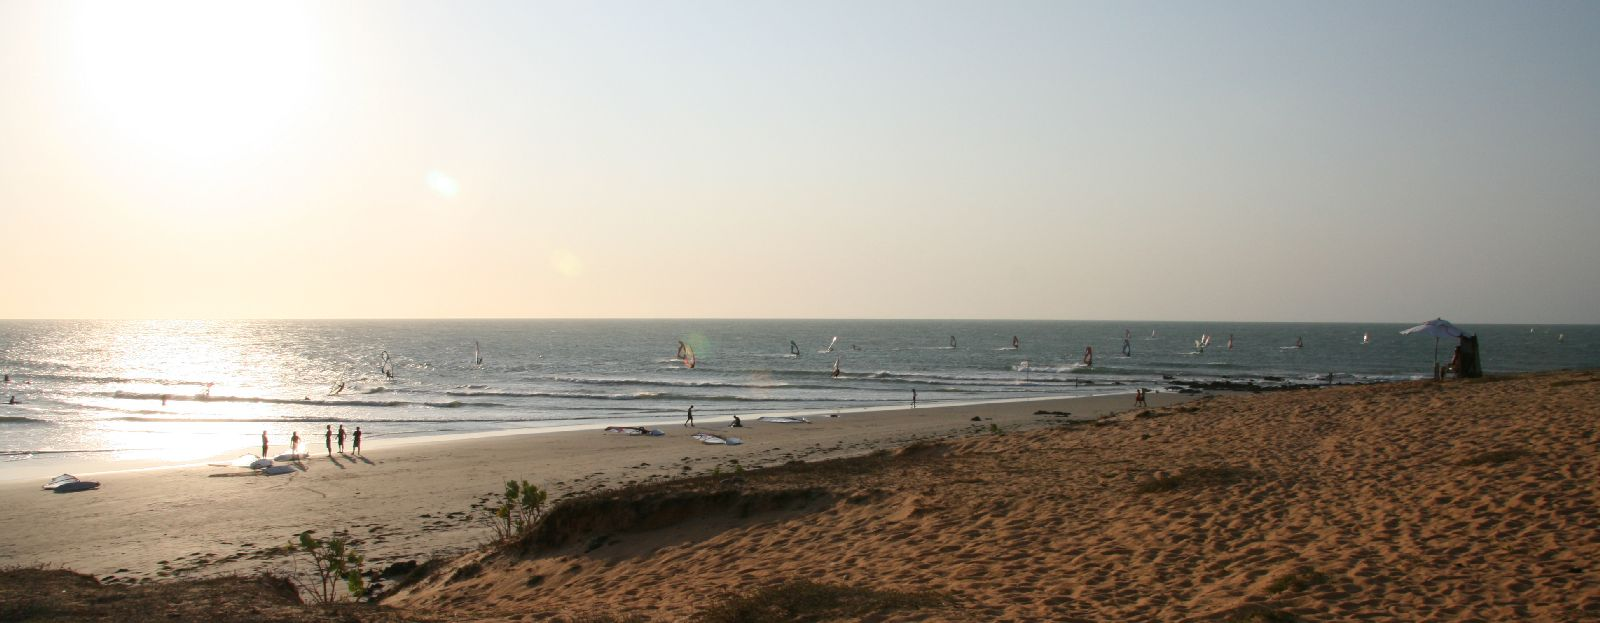 Windsurfen_Jericoacoara_IMG_0631.JPG